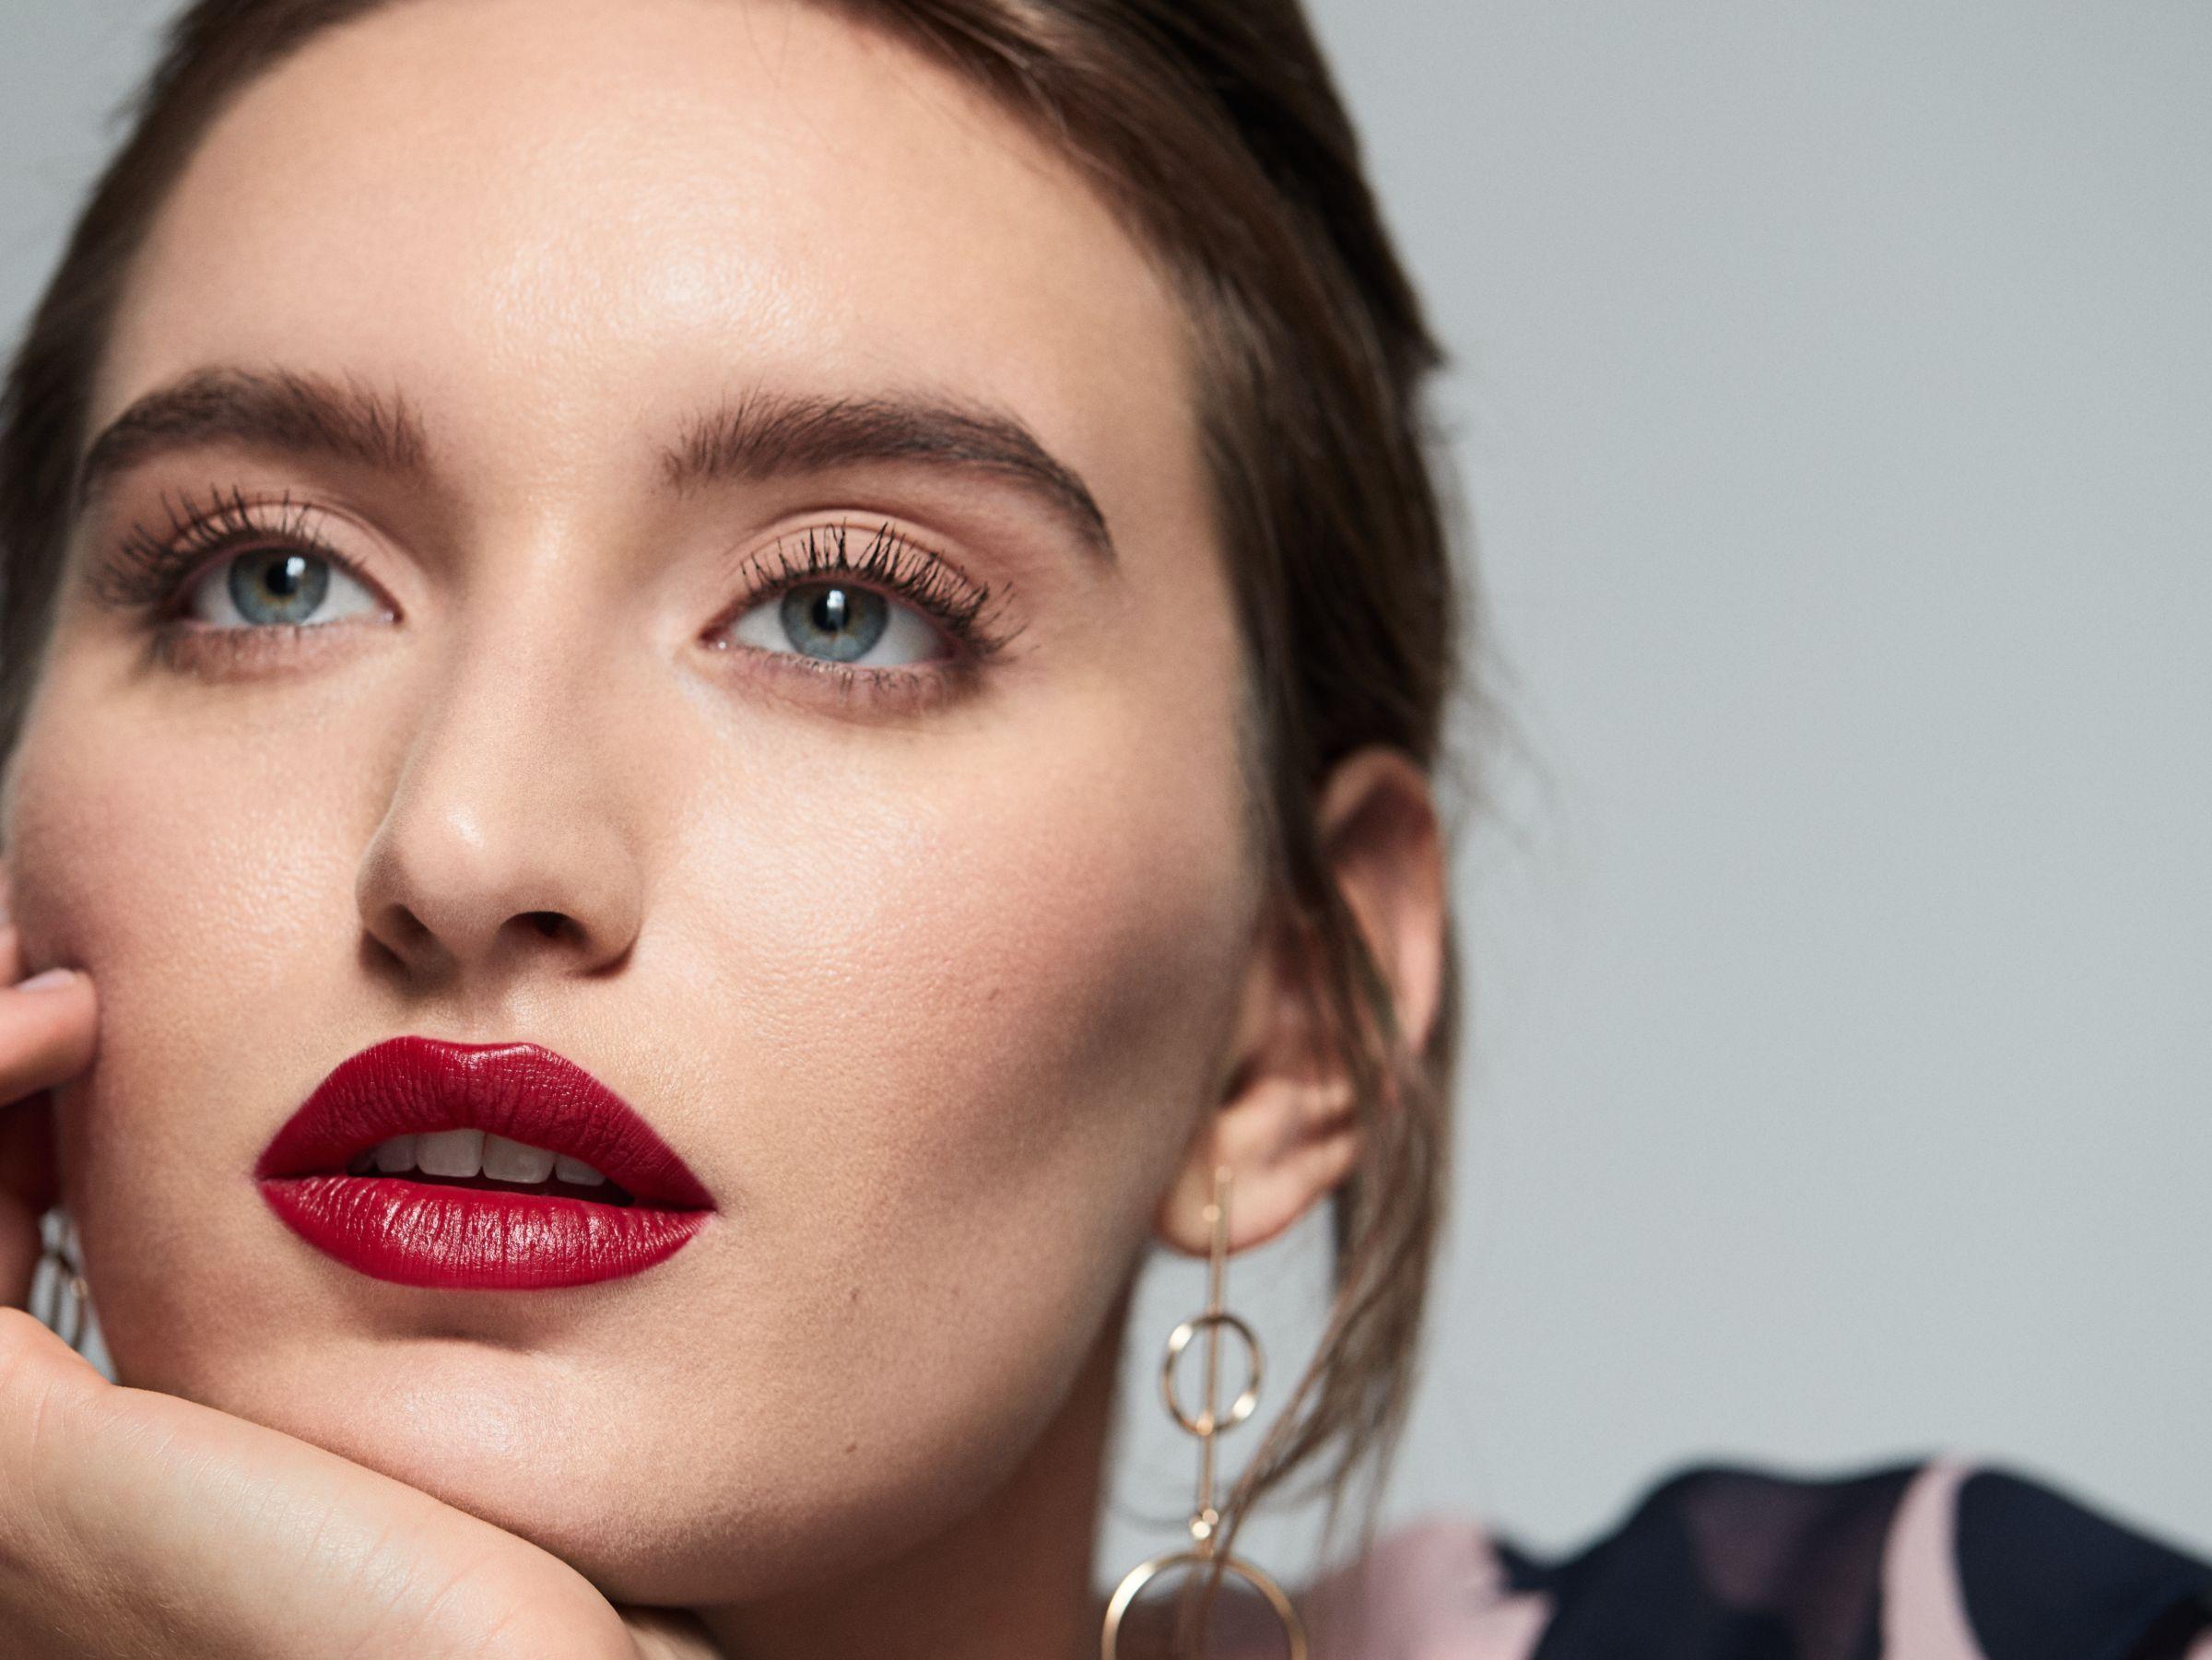 Statement lip make-up